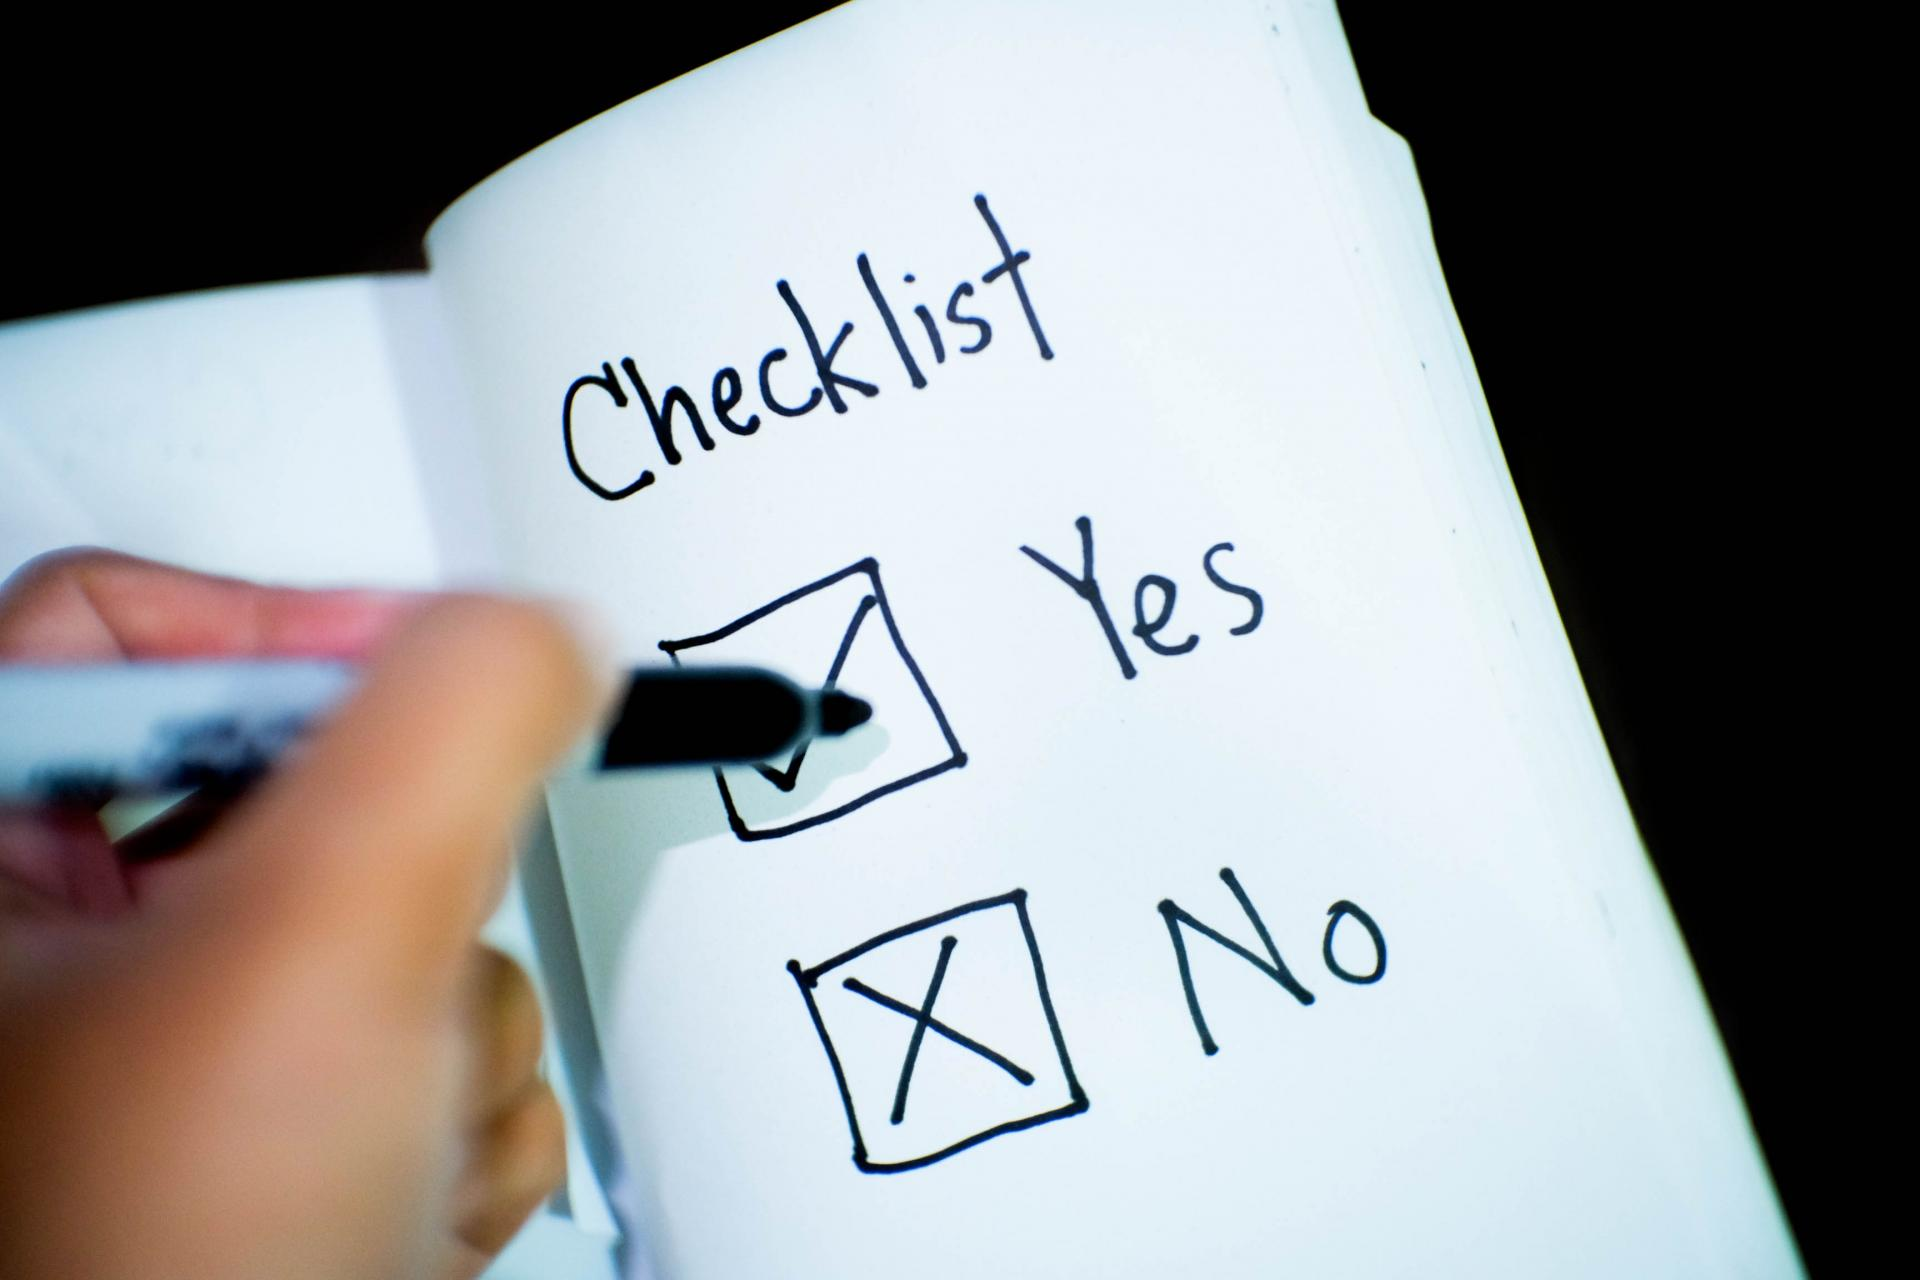 Couples Checklist